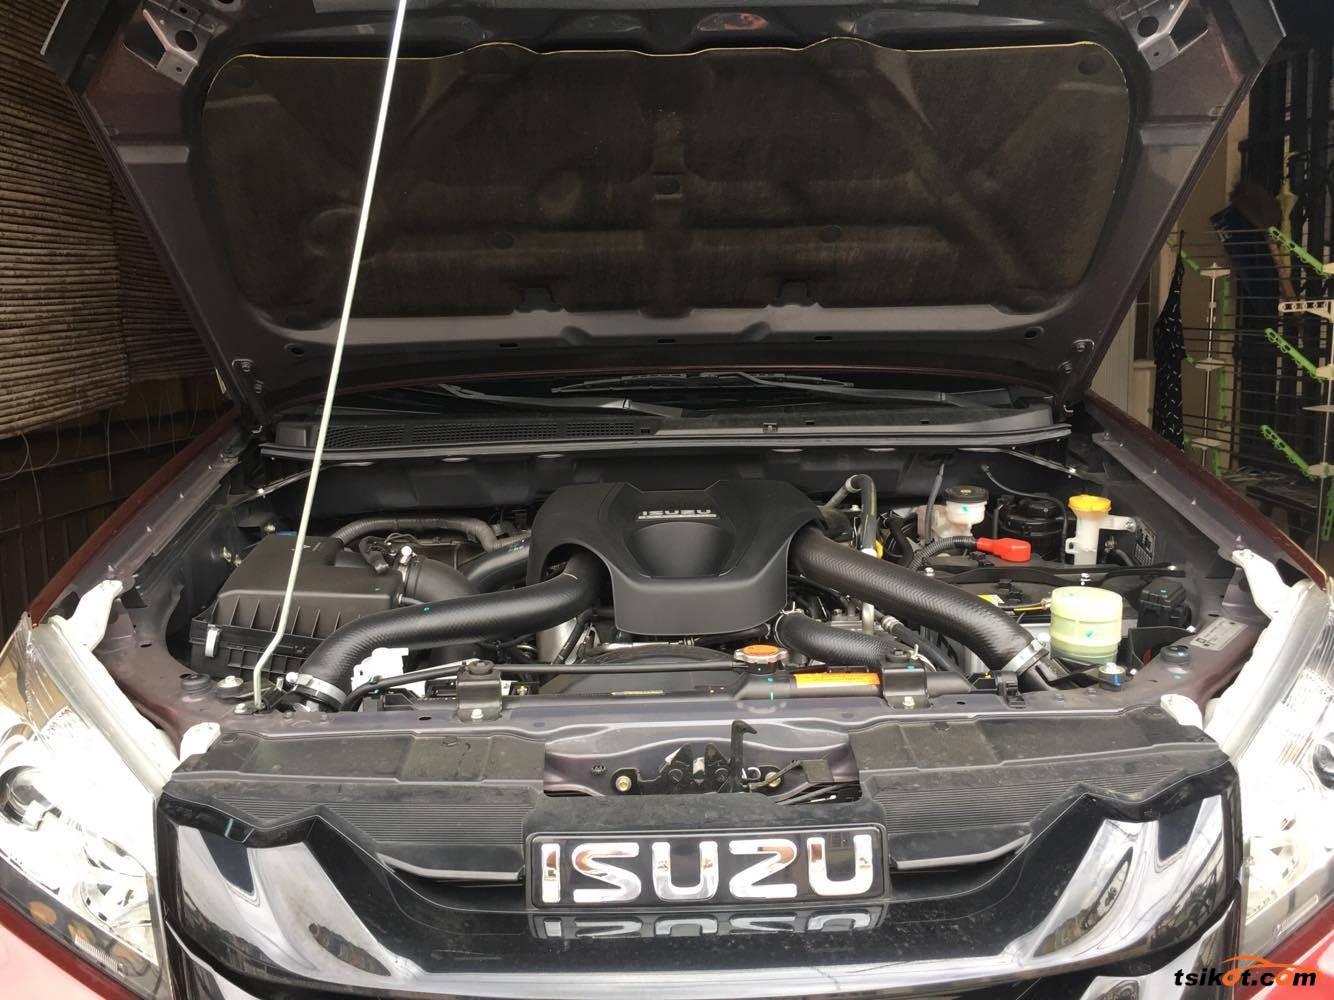 Isuzu Mu-X 2017 - 5